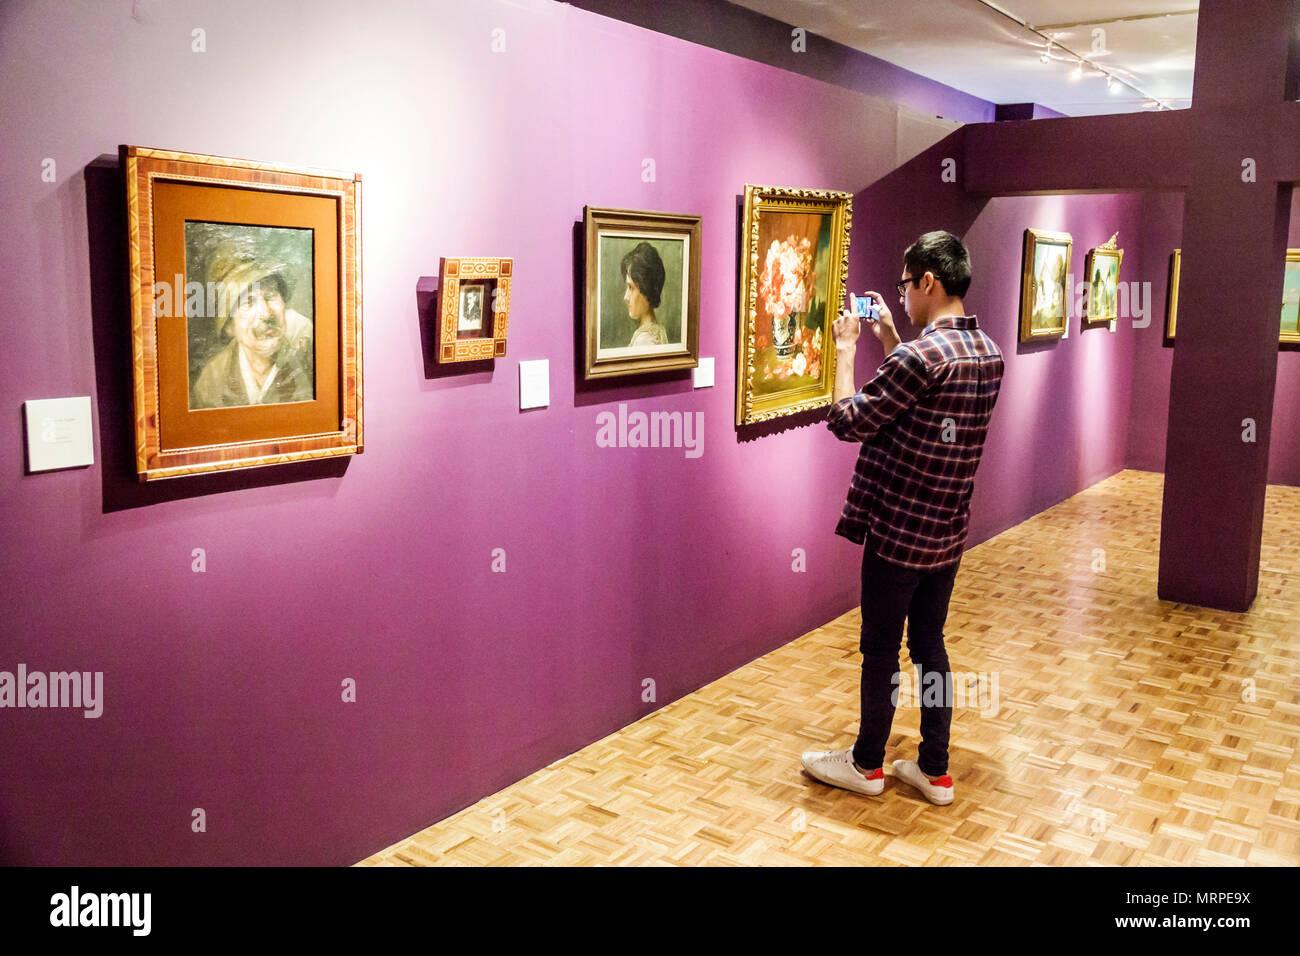 ... CDMX Cuauhtemoc Tabacalera Museo Nacional de San Carlos National Museum  Art Museum Ausstellung innen Deutsche Gedovius Galerie Malerei junge Teen  unter ...